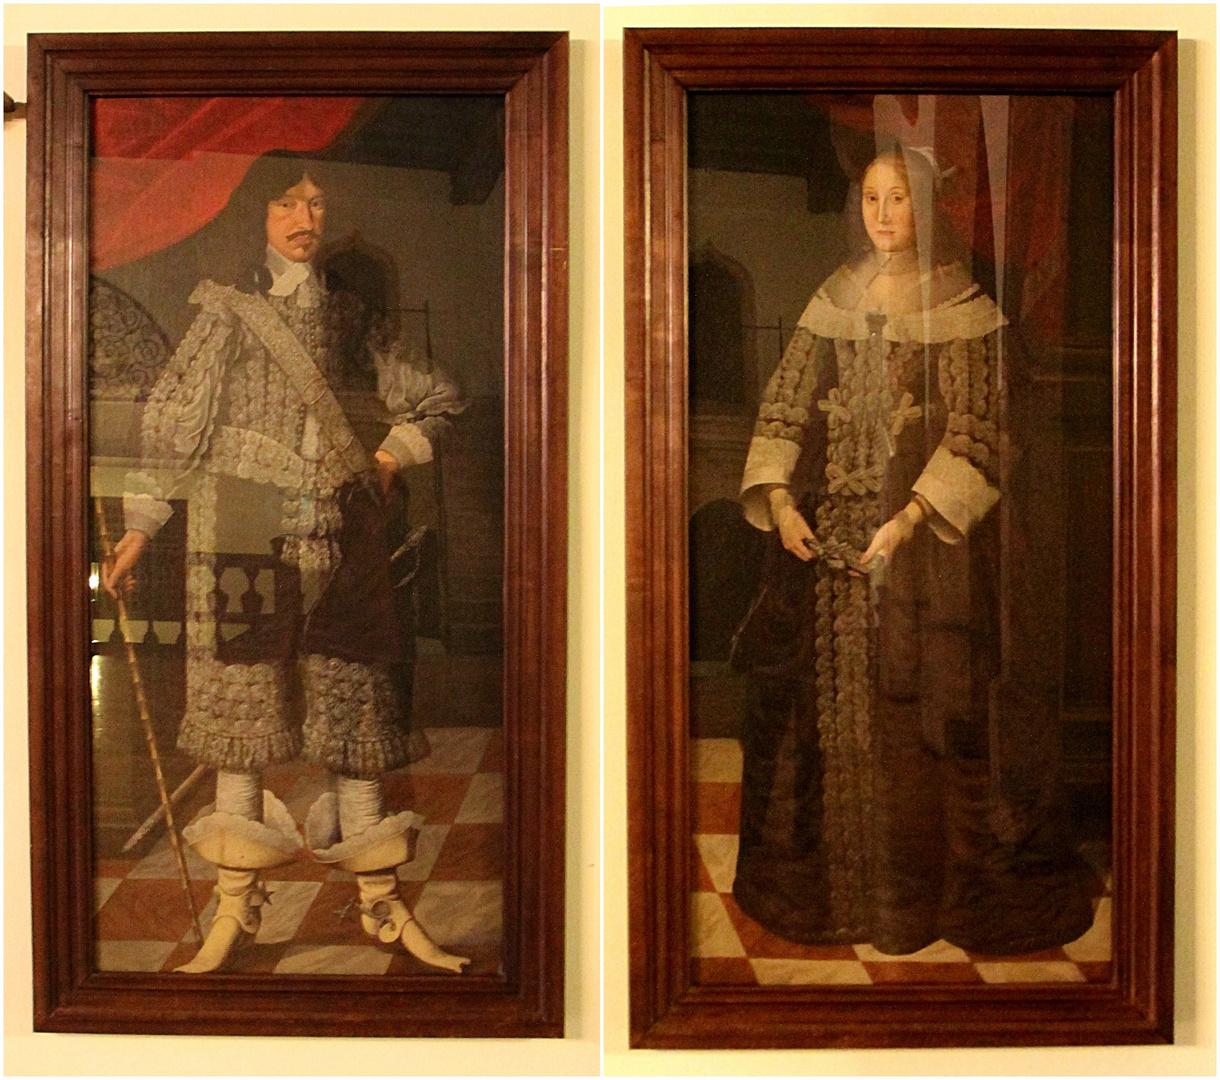 Die Eltern des Erbauers des Jenaer Stadtschlosses